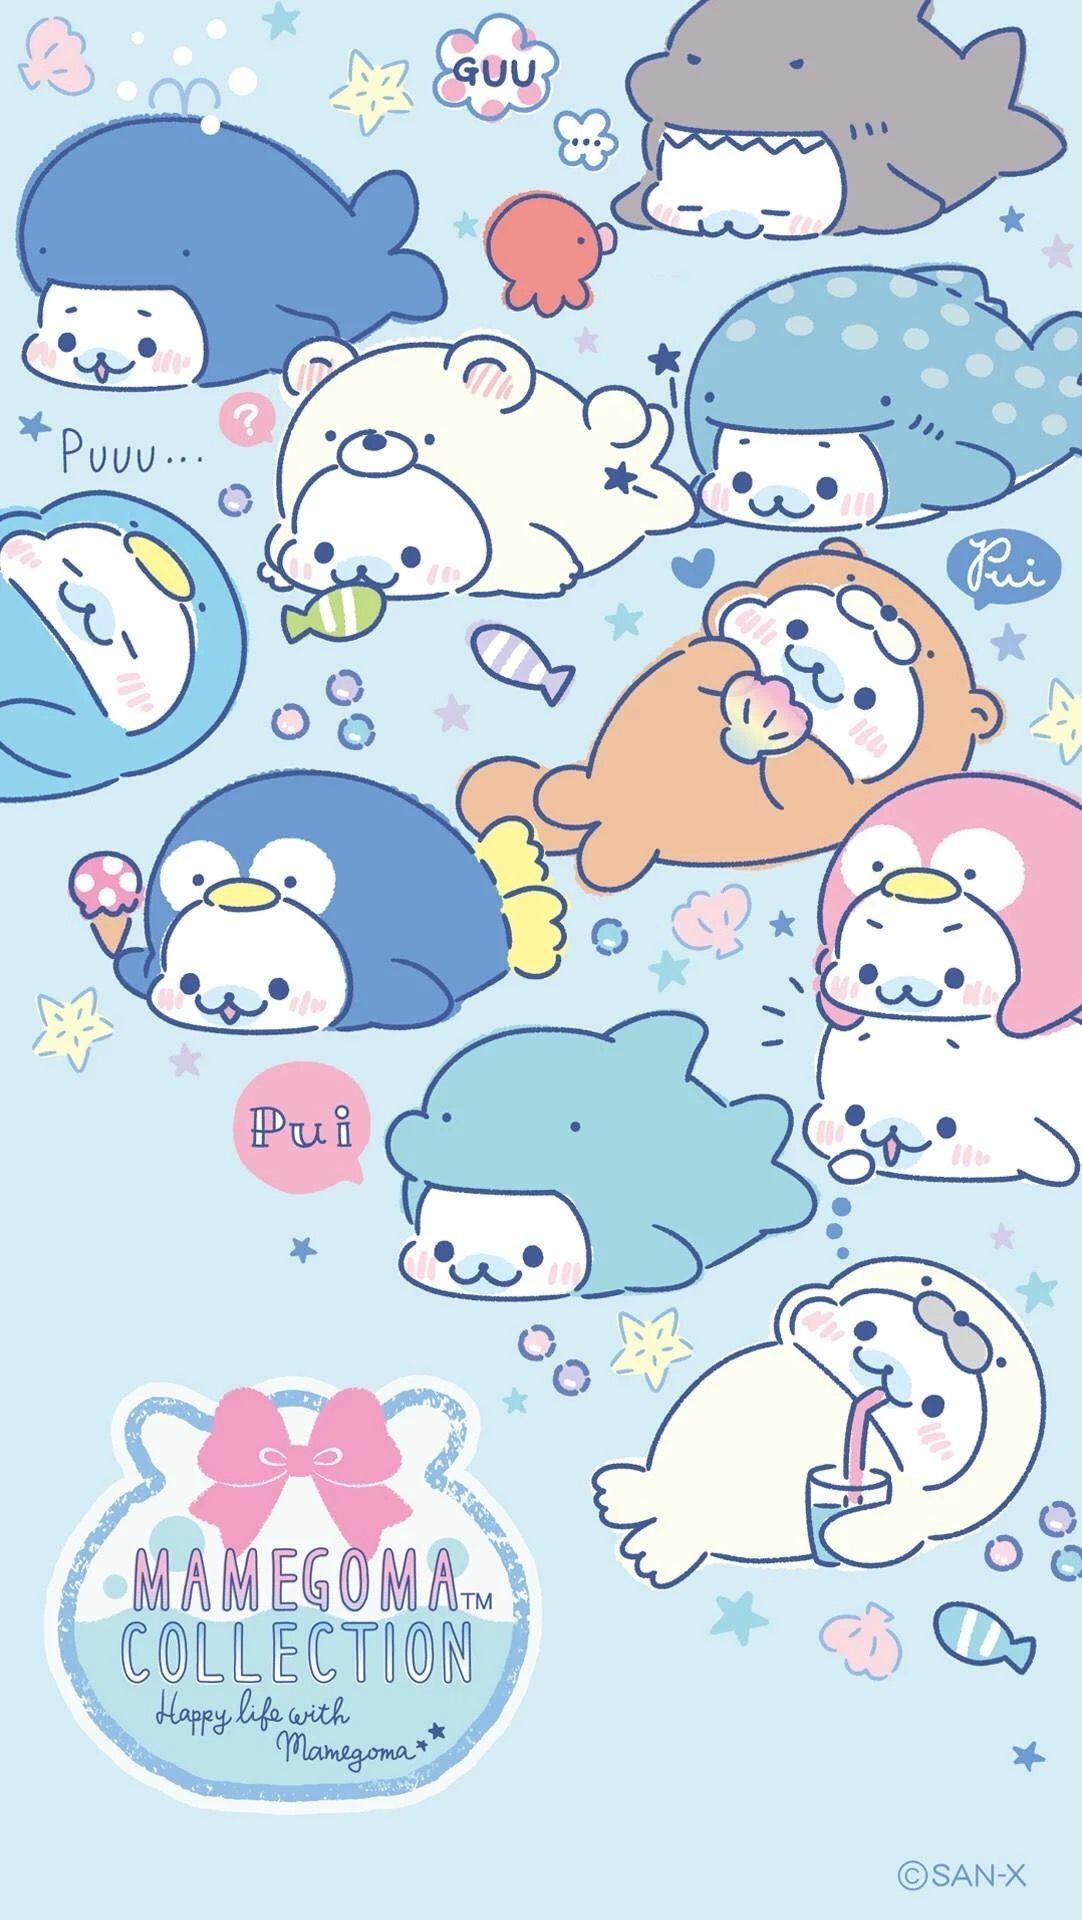 Kawaii Wallpaper Iphone Pastel Blue 2563988 Hd Wallpaper Backgrounds Download